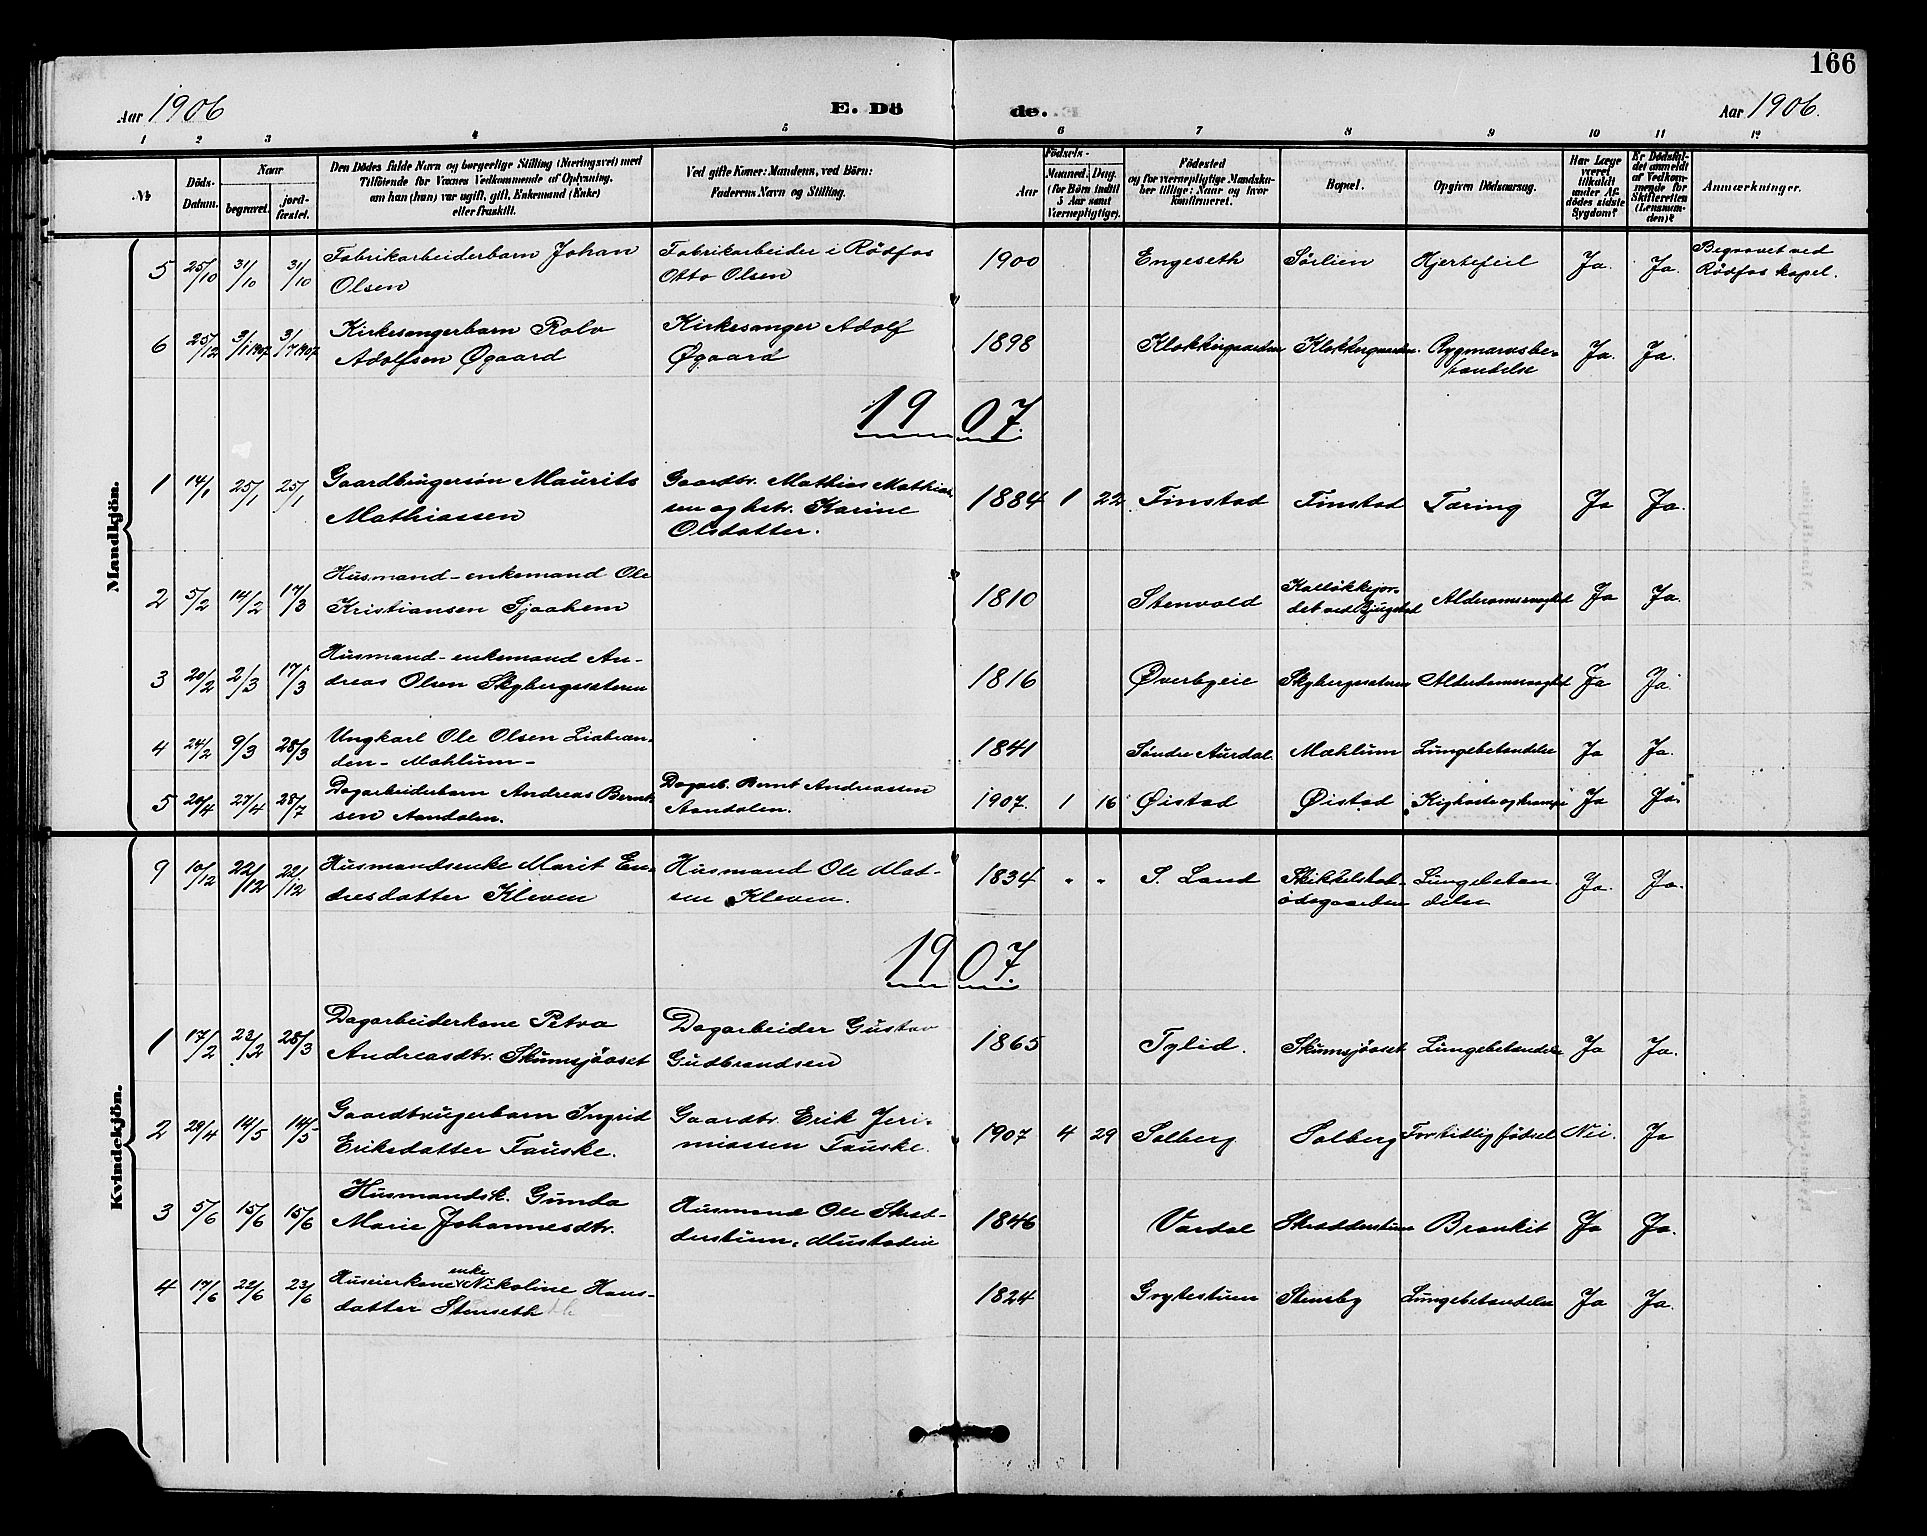 SAH, Vardal prestekontor, H/Ha/Hab/L0011: Klokkerbok nr. 11, 1899-1913, s. 166